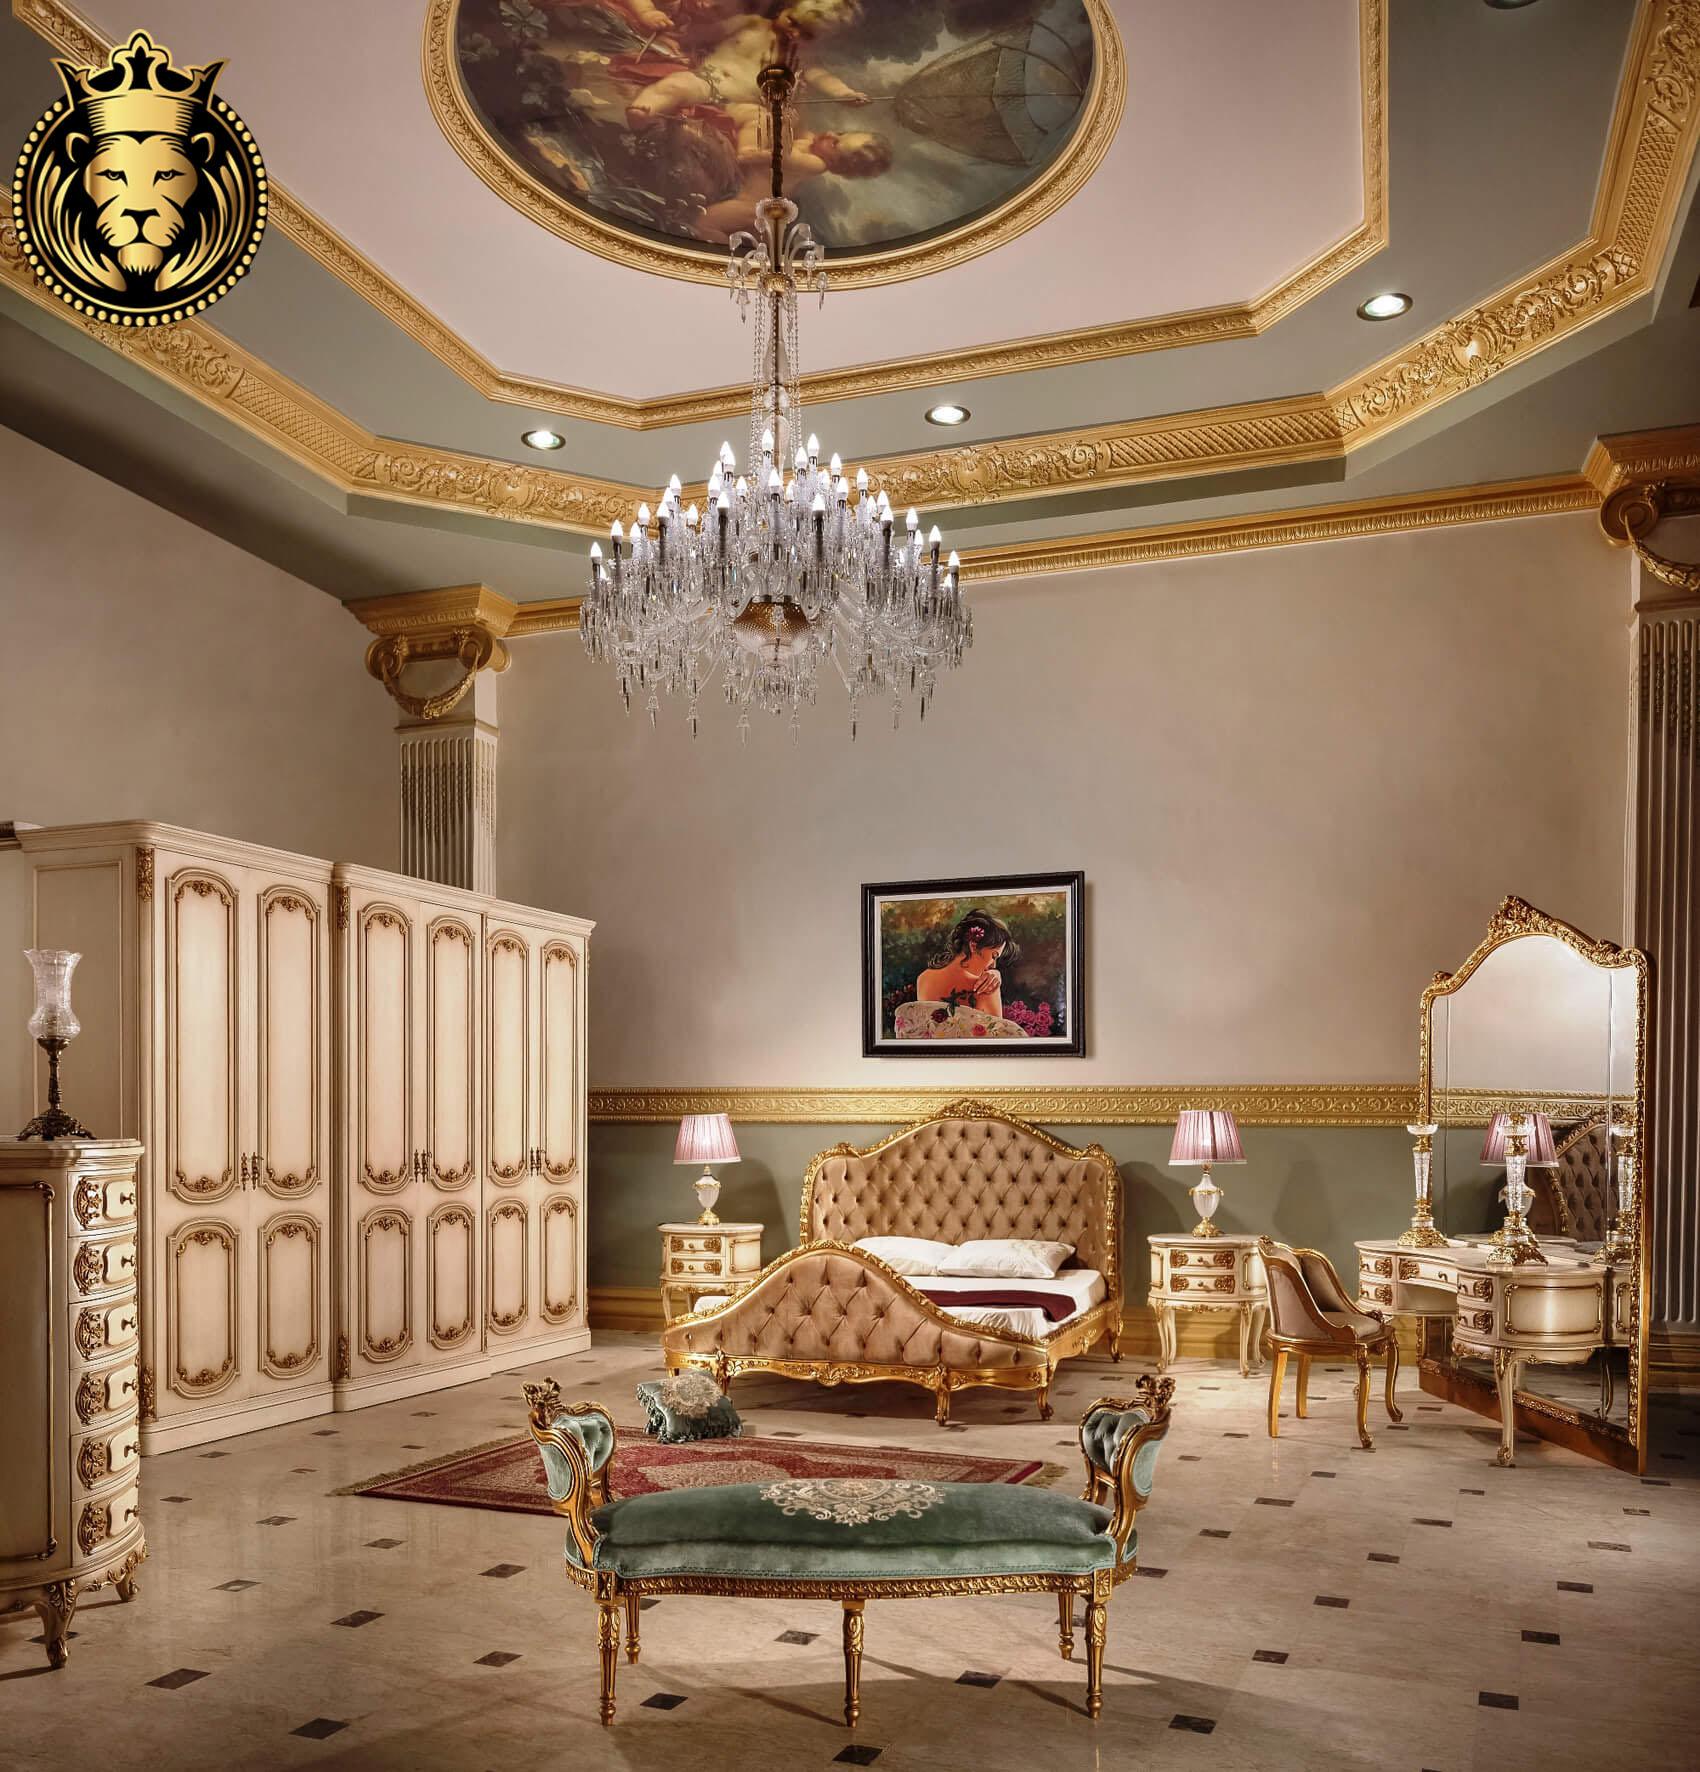 Olive French Style Carved Royal Bedroom Set